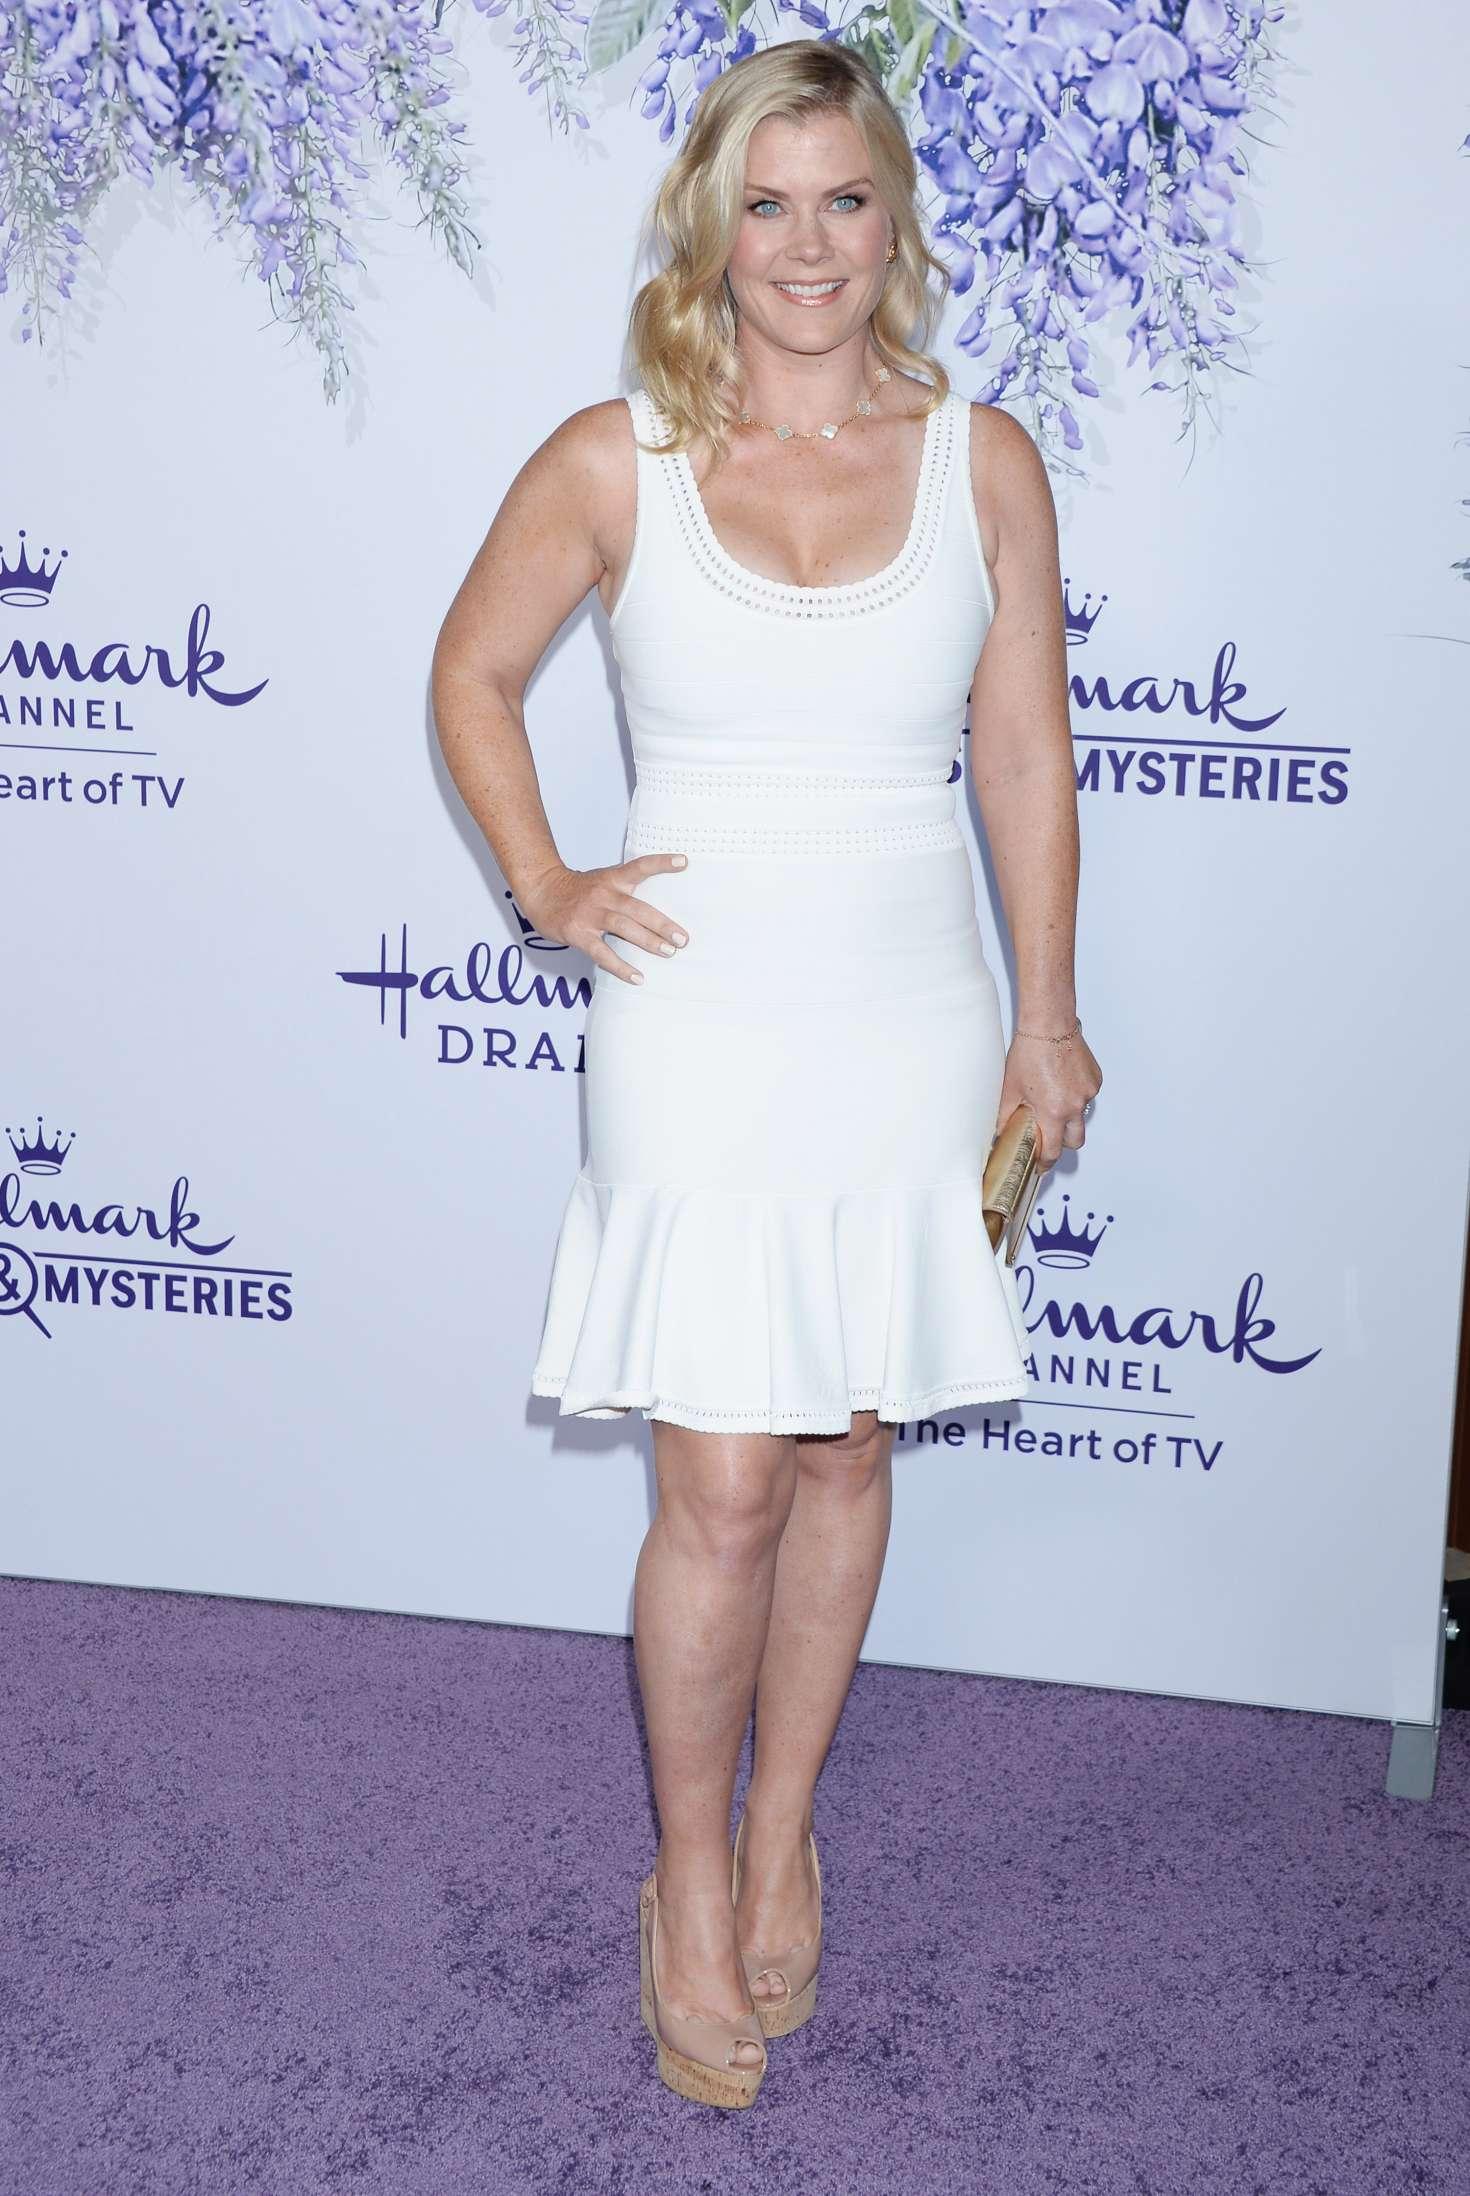 Alison Sweeney 2018 : Alison Sweeney: 2018 Hallmarks Evening Gala TCA Summer Press Tour -01